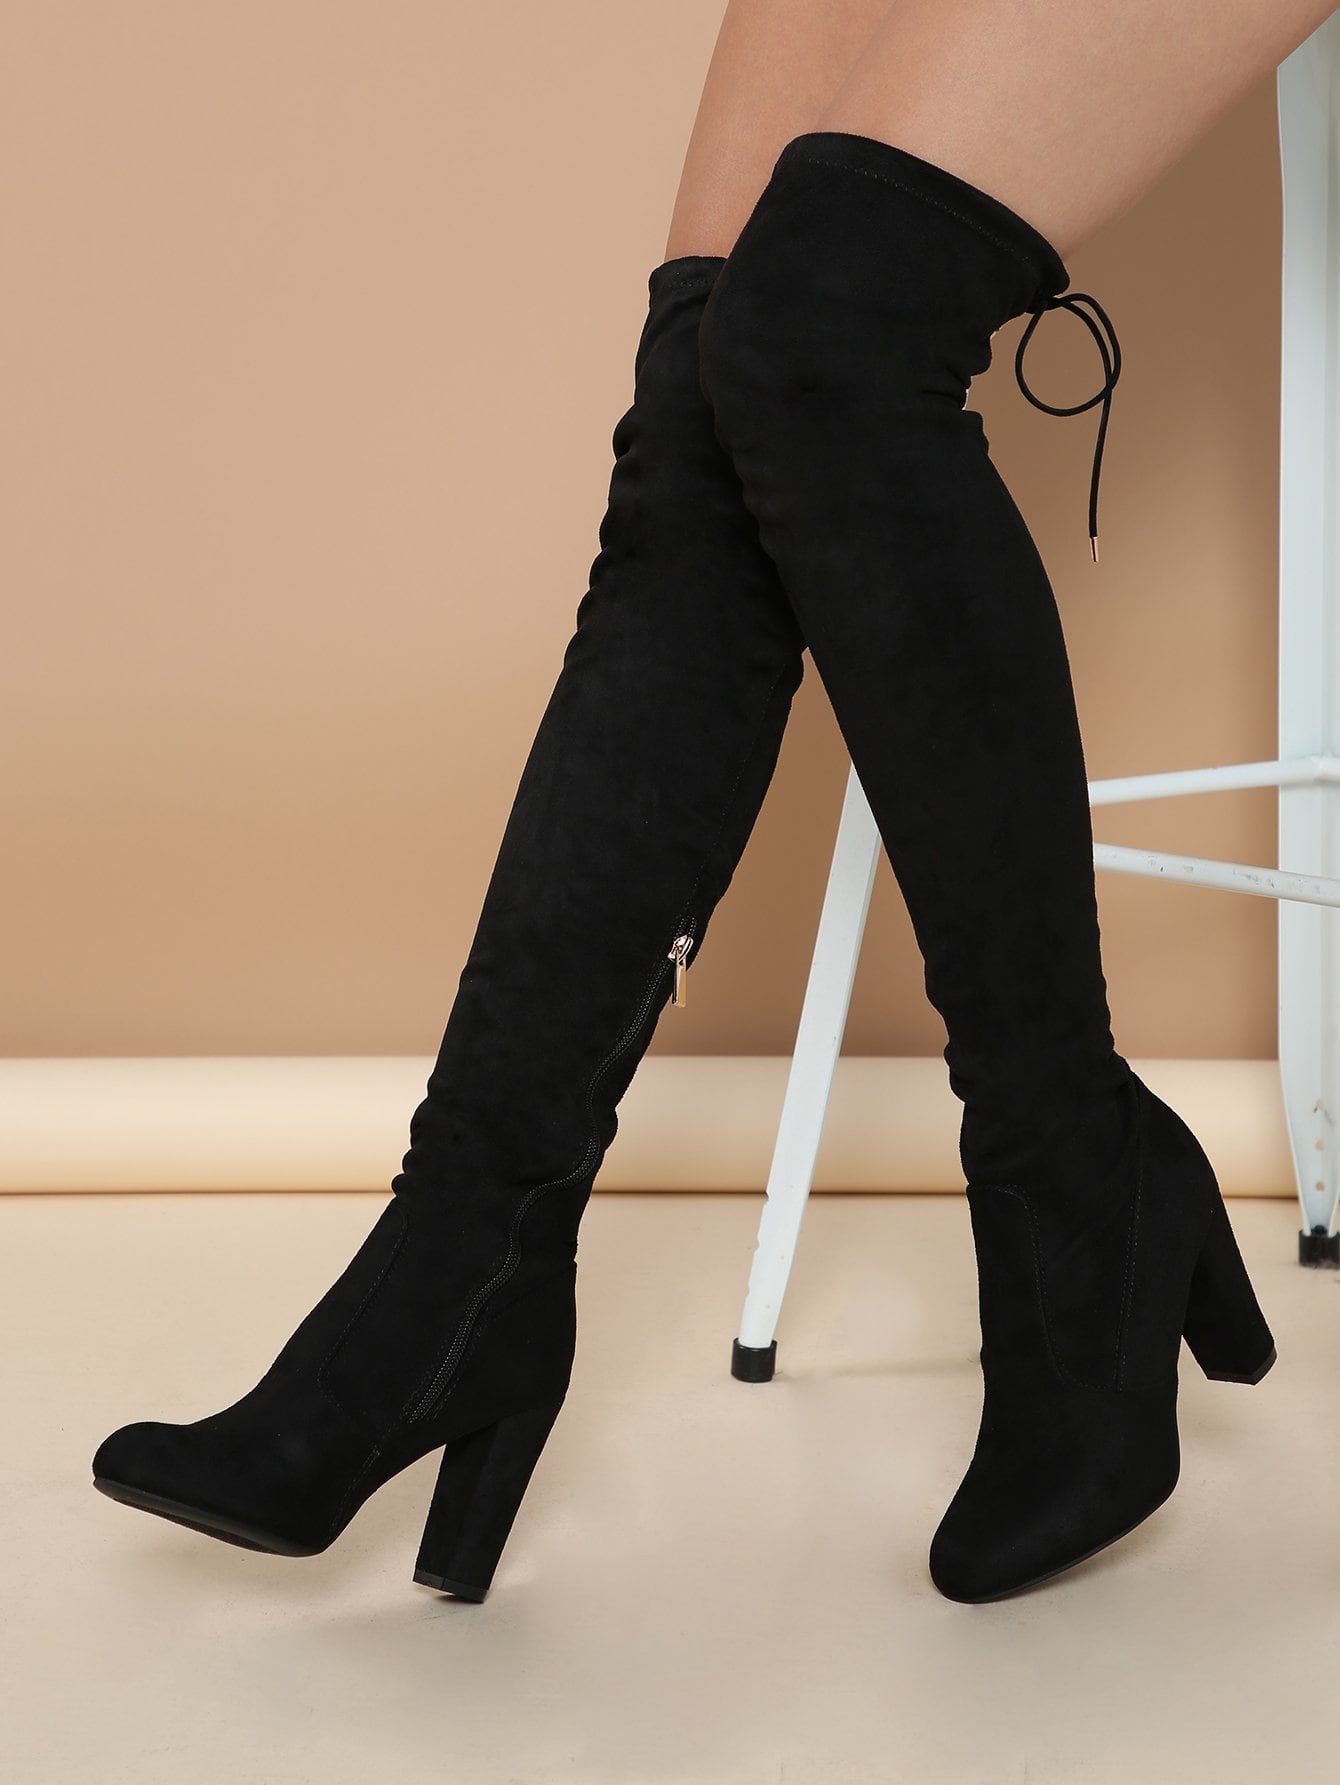 Glamorous Sock Boots Side zipper Black High Heel Chunky Almond Toe Chunky Heel Thigh High Boots 1